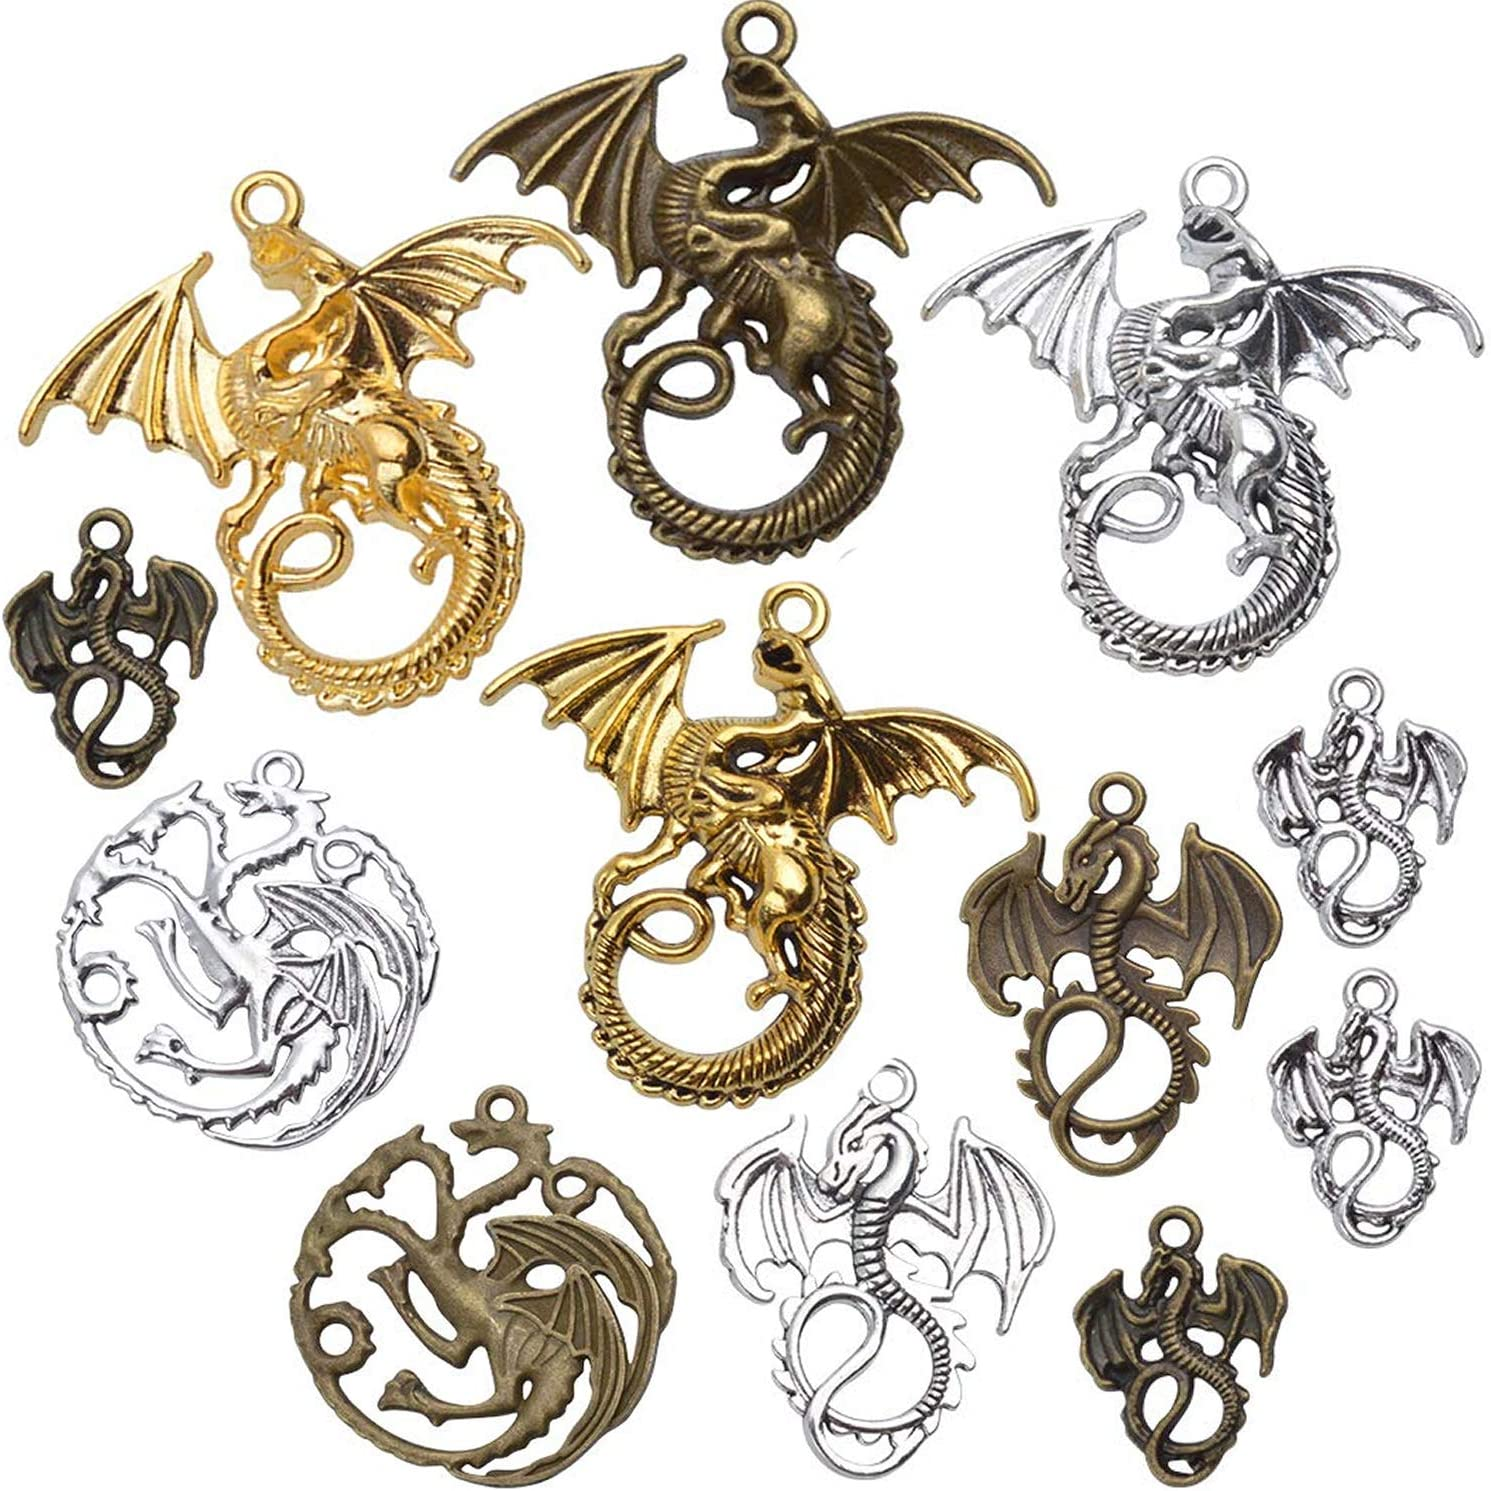 30 Baby Dragon Charm Flying Animal Charm Mythical Antique Silver Tone 16x21 922